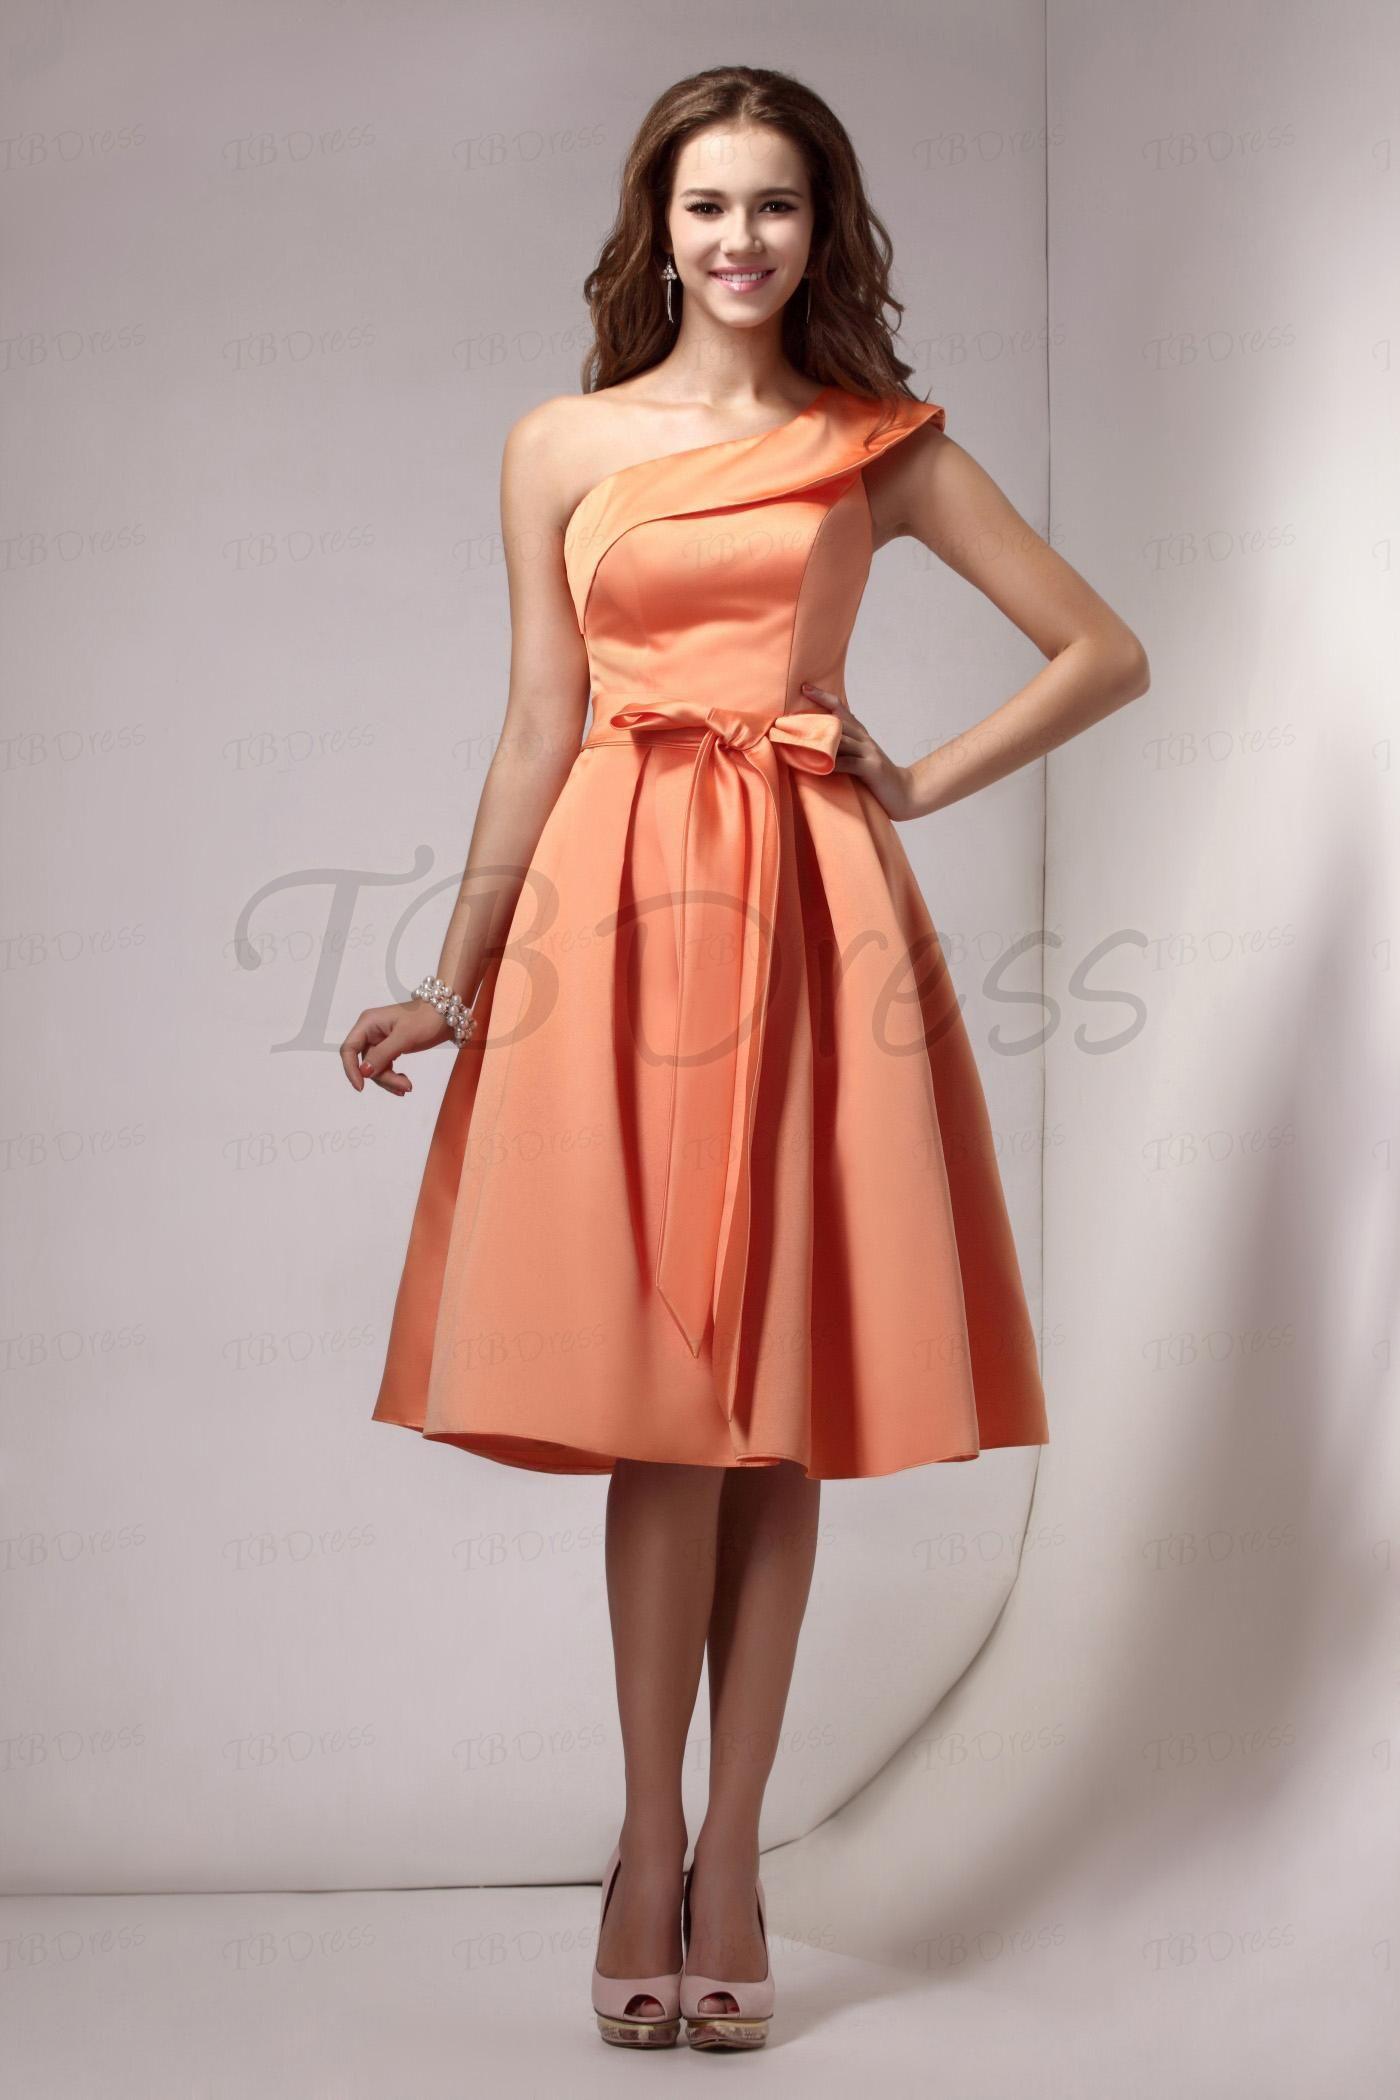 Ruched aline sashesribbons oneshoulder short bridesmaid dress